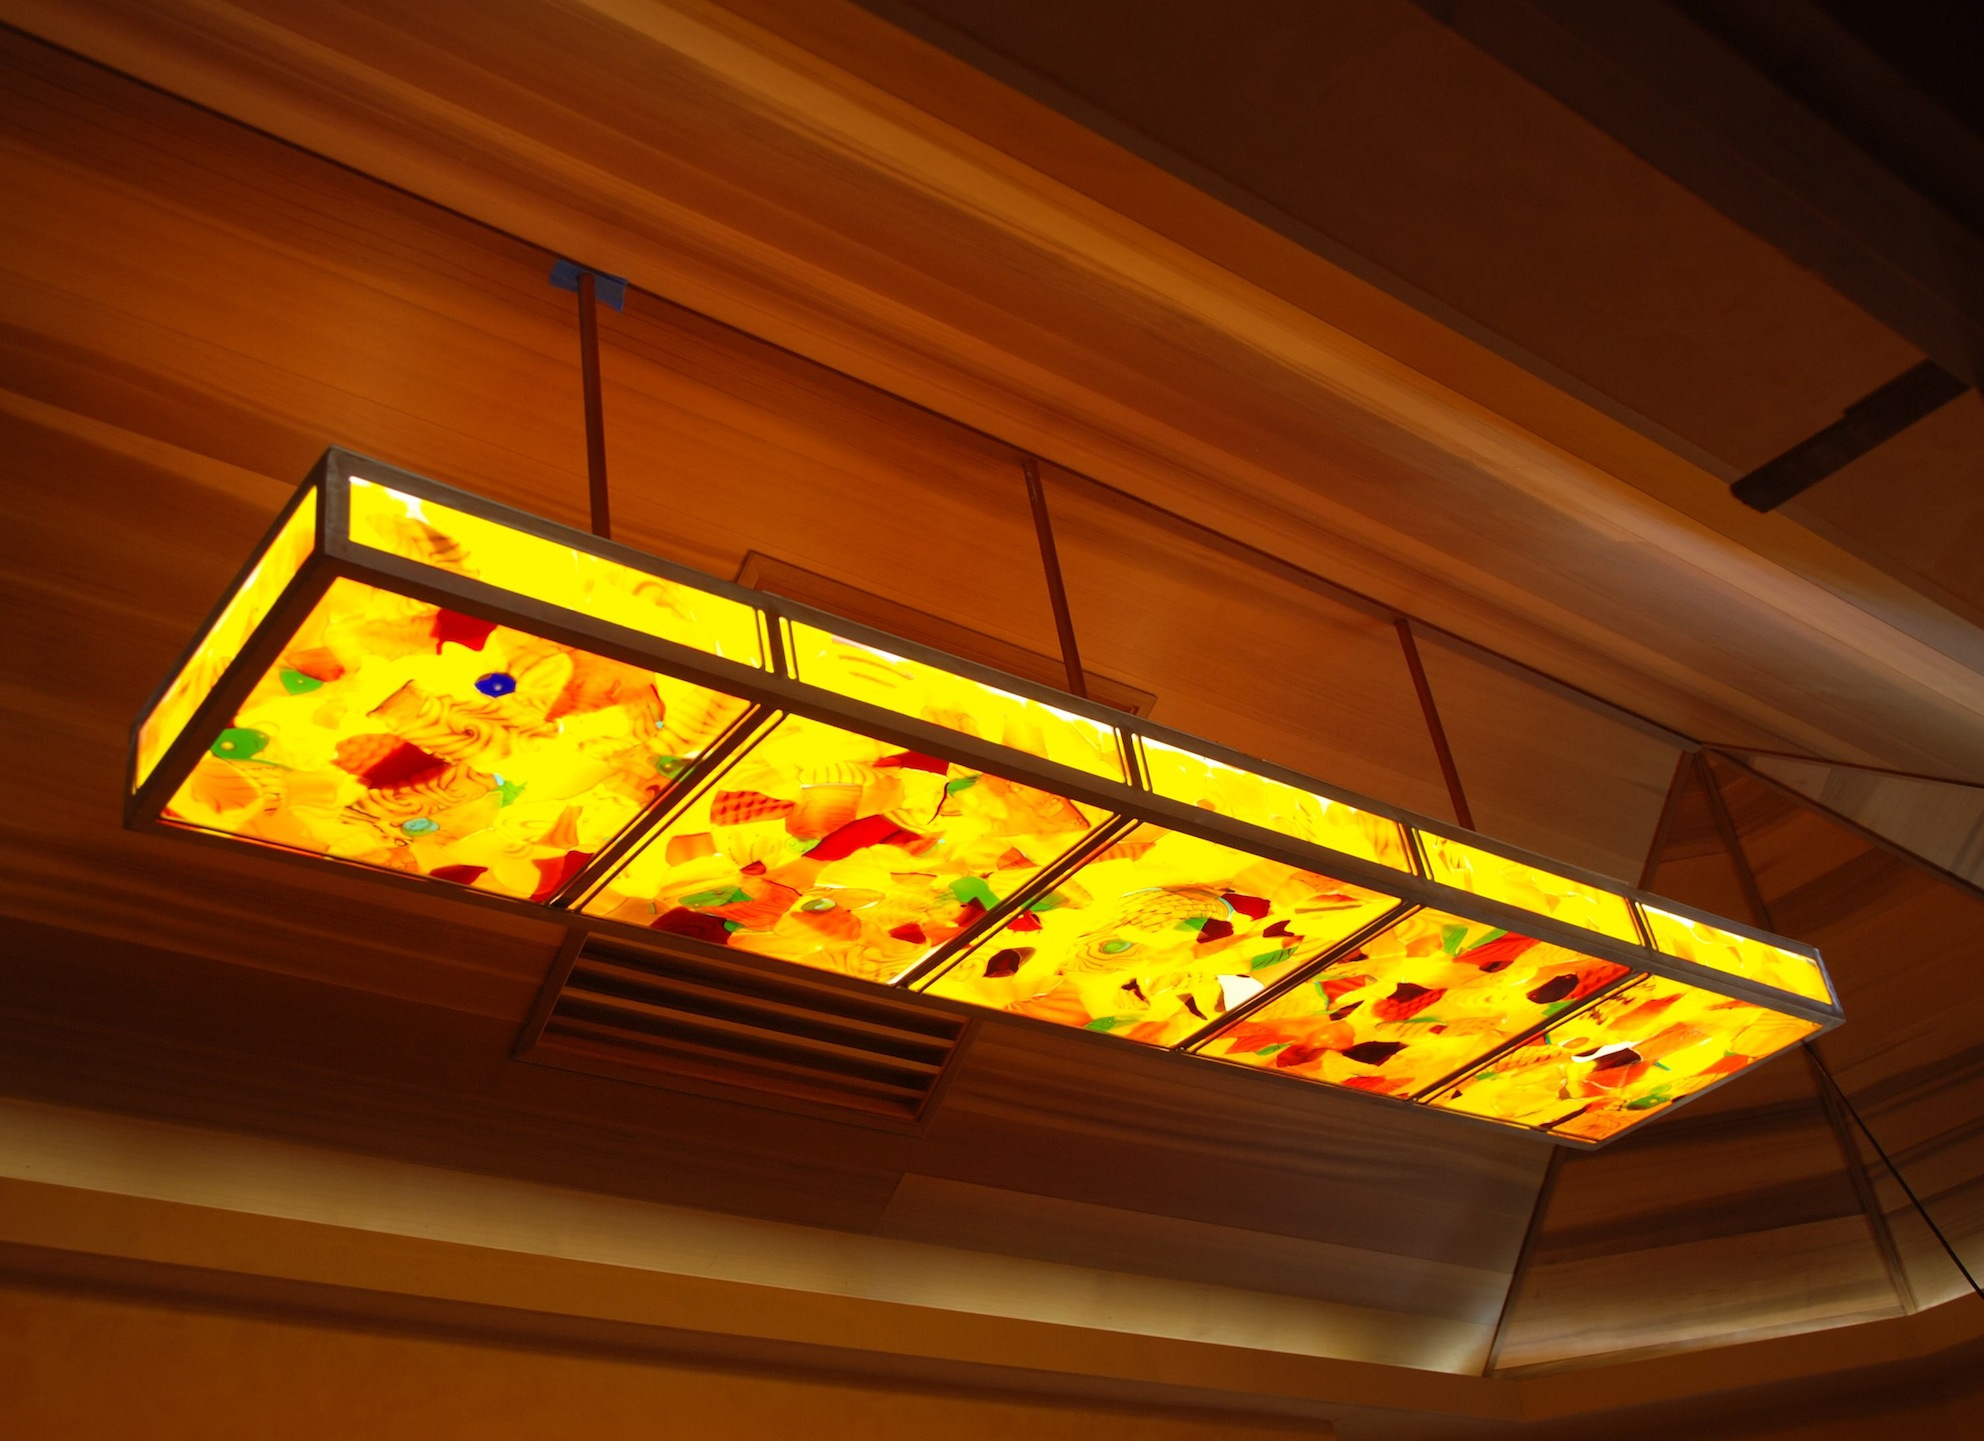 "Fused Glass Lamp 2' x 8' x 6"" Sugar Cove"